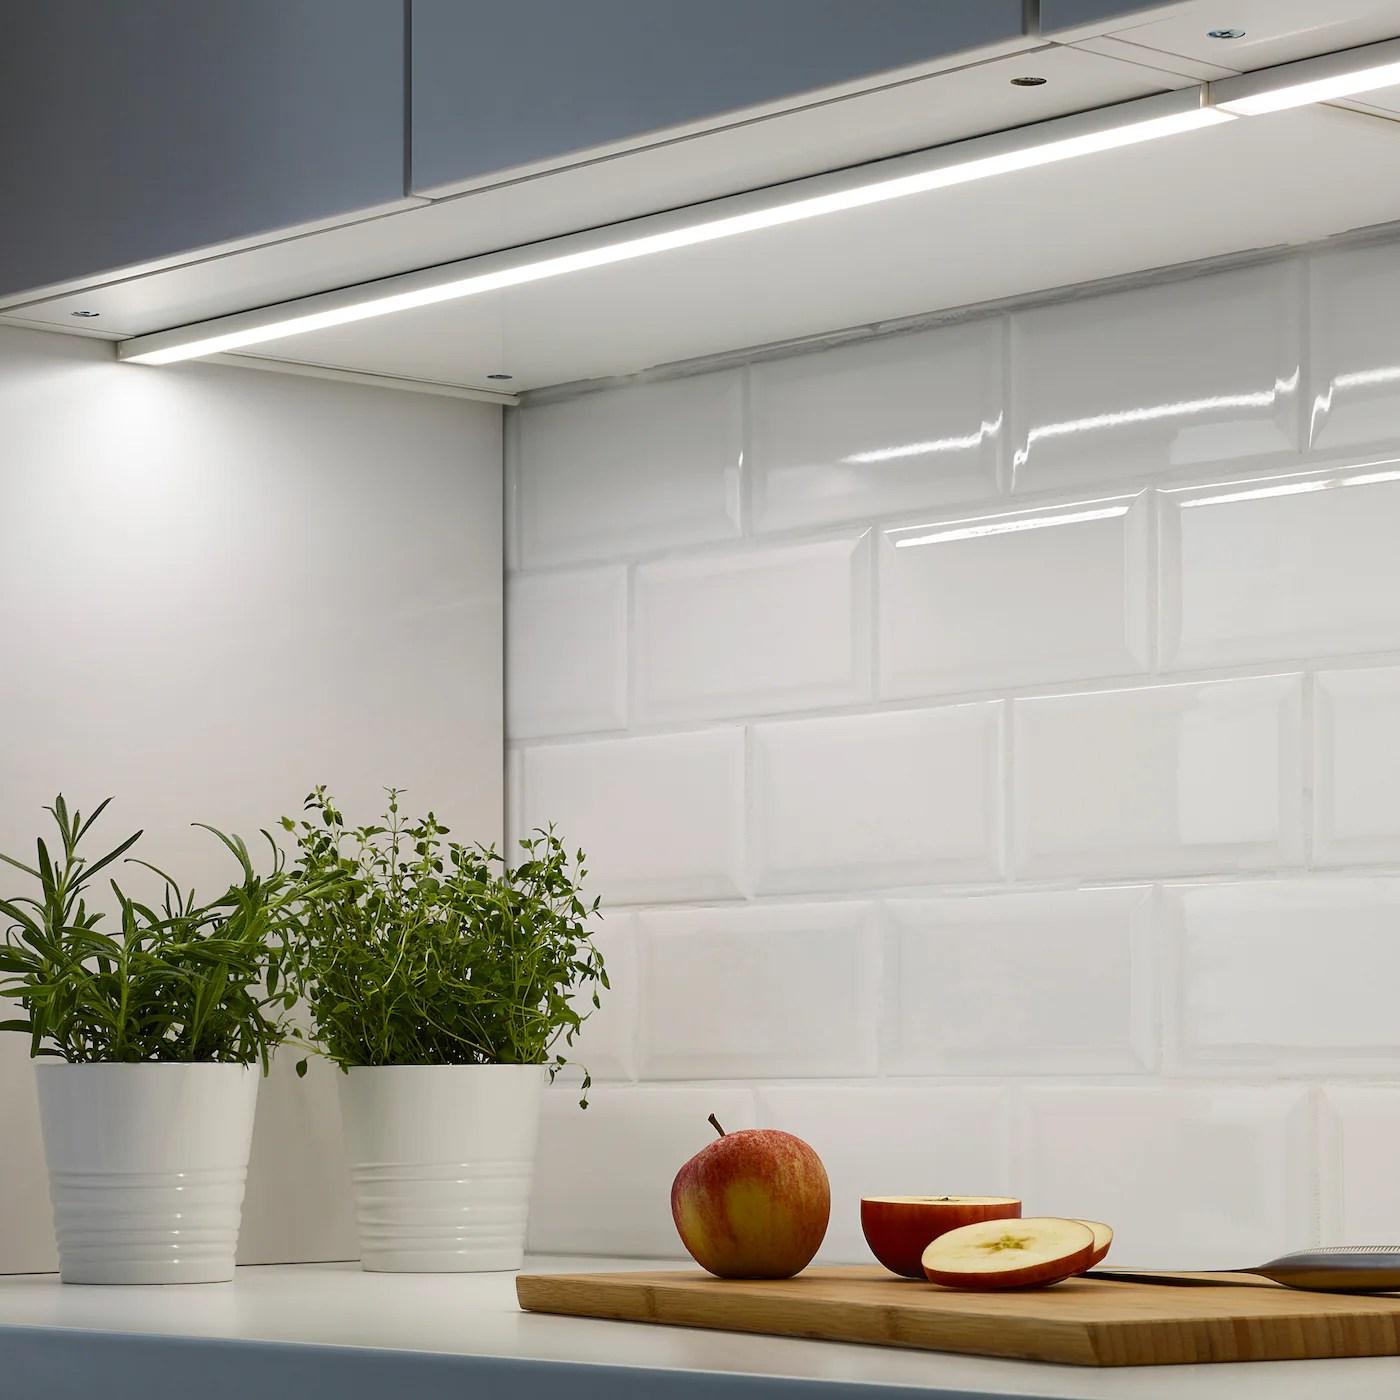 omlopp eclairage plan travail a led blanc 80 cm